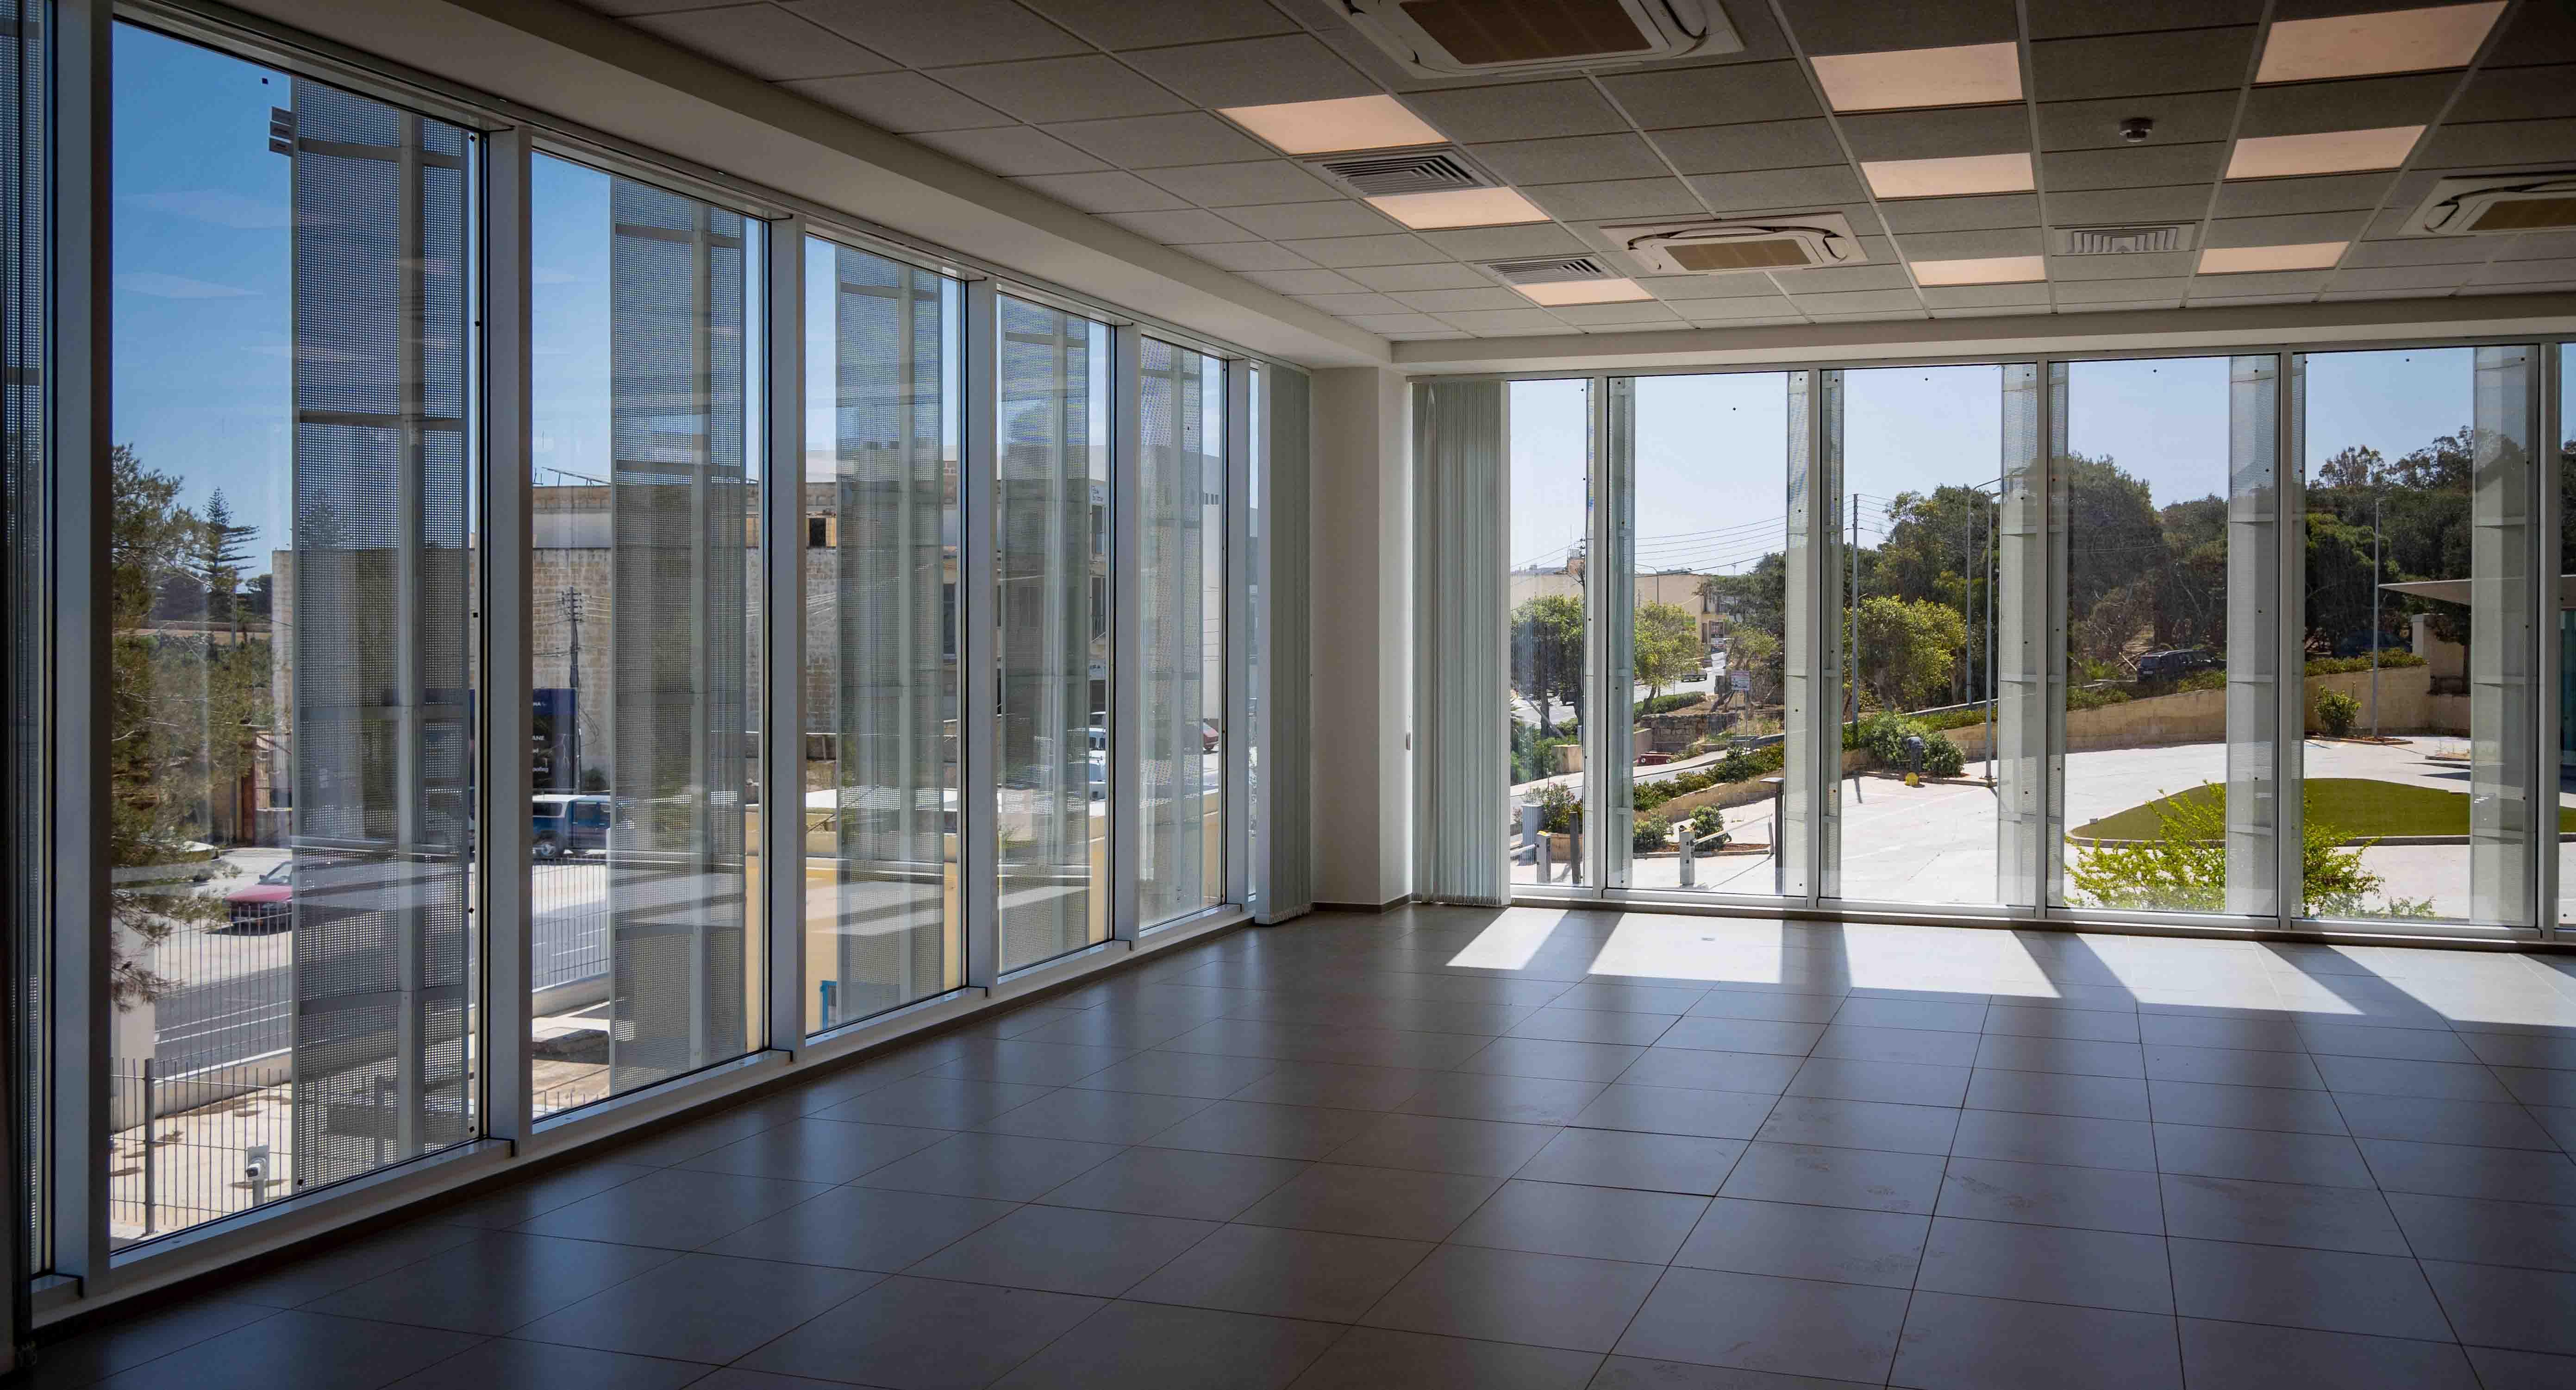 Office space Kurt Borg Coppini